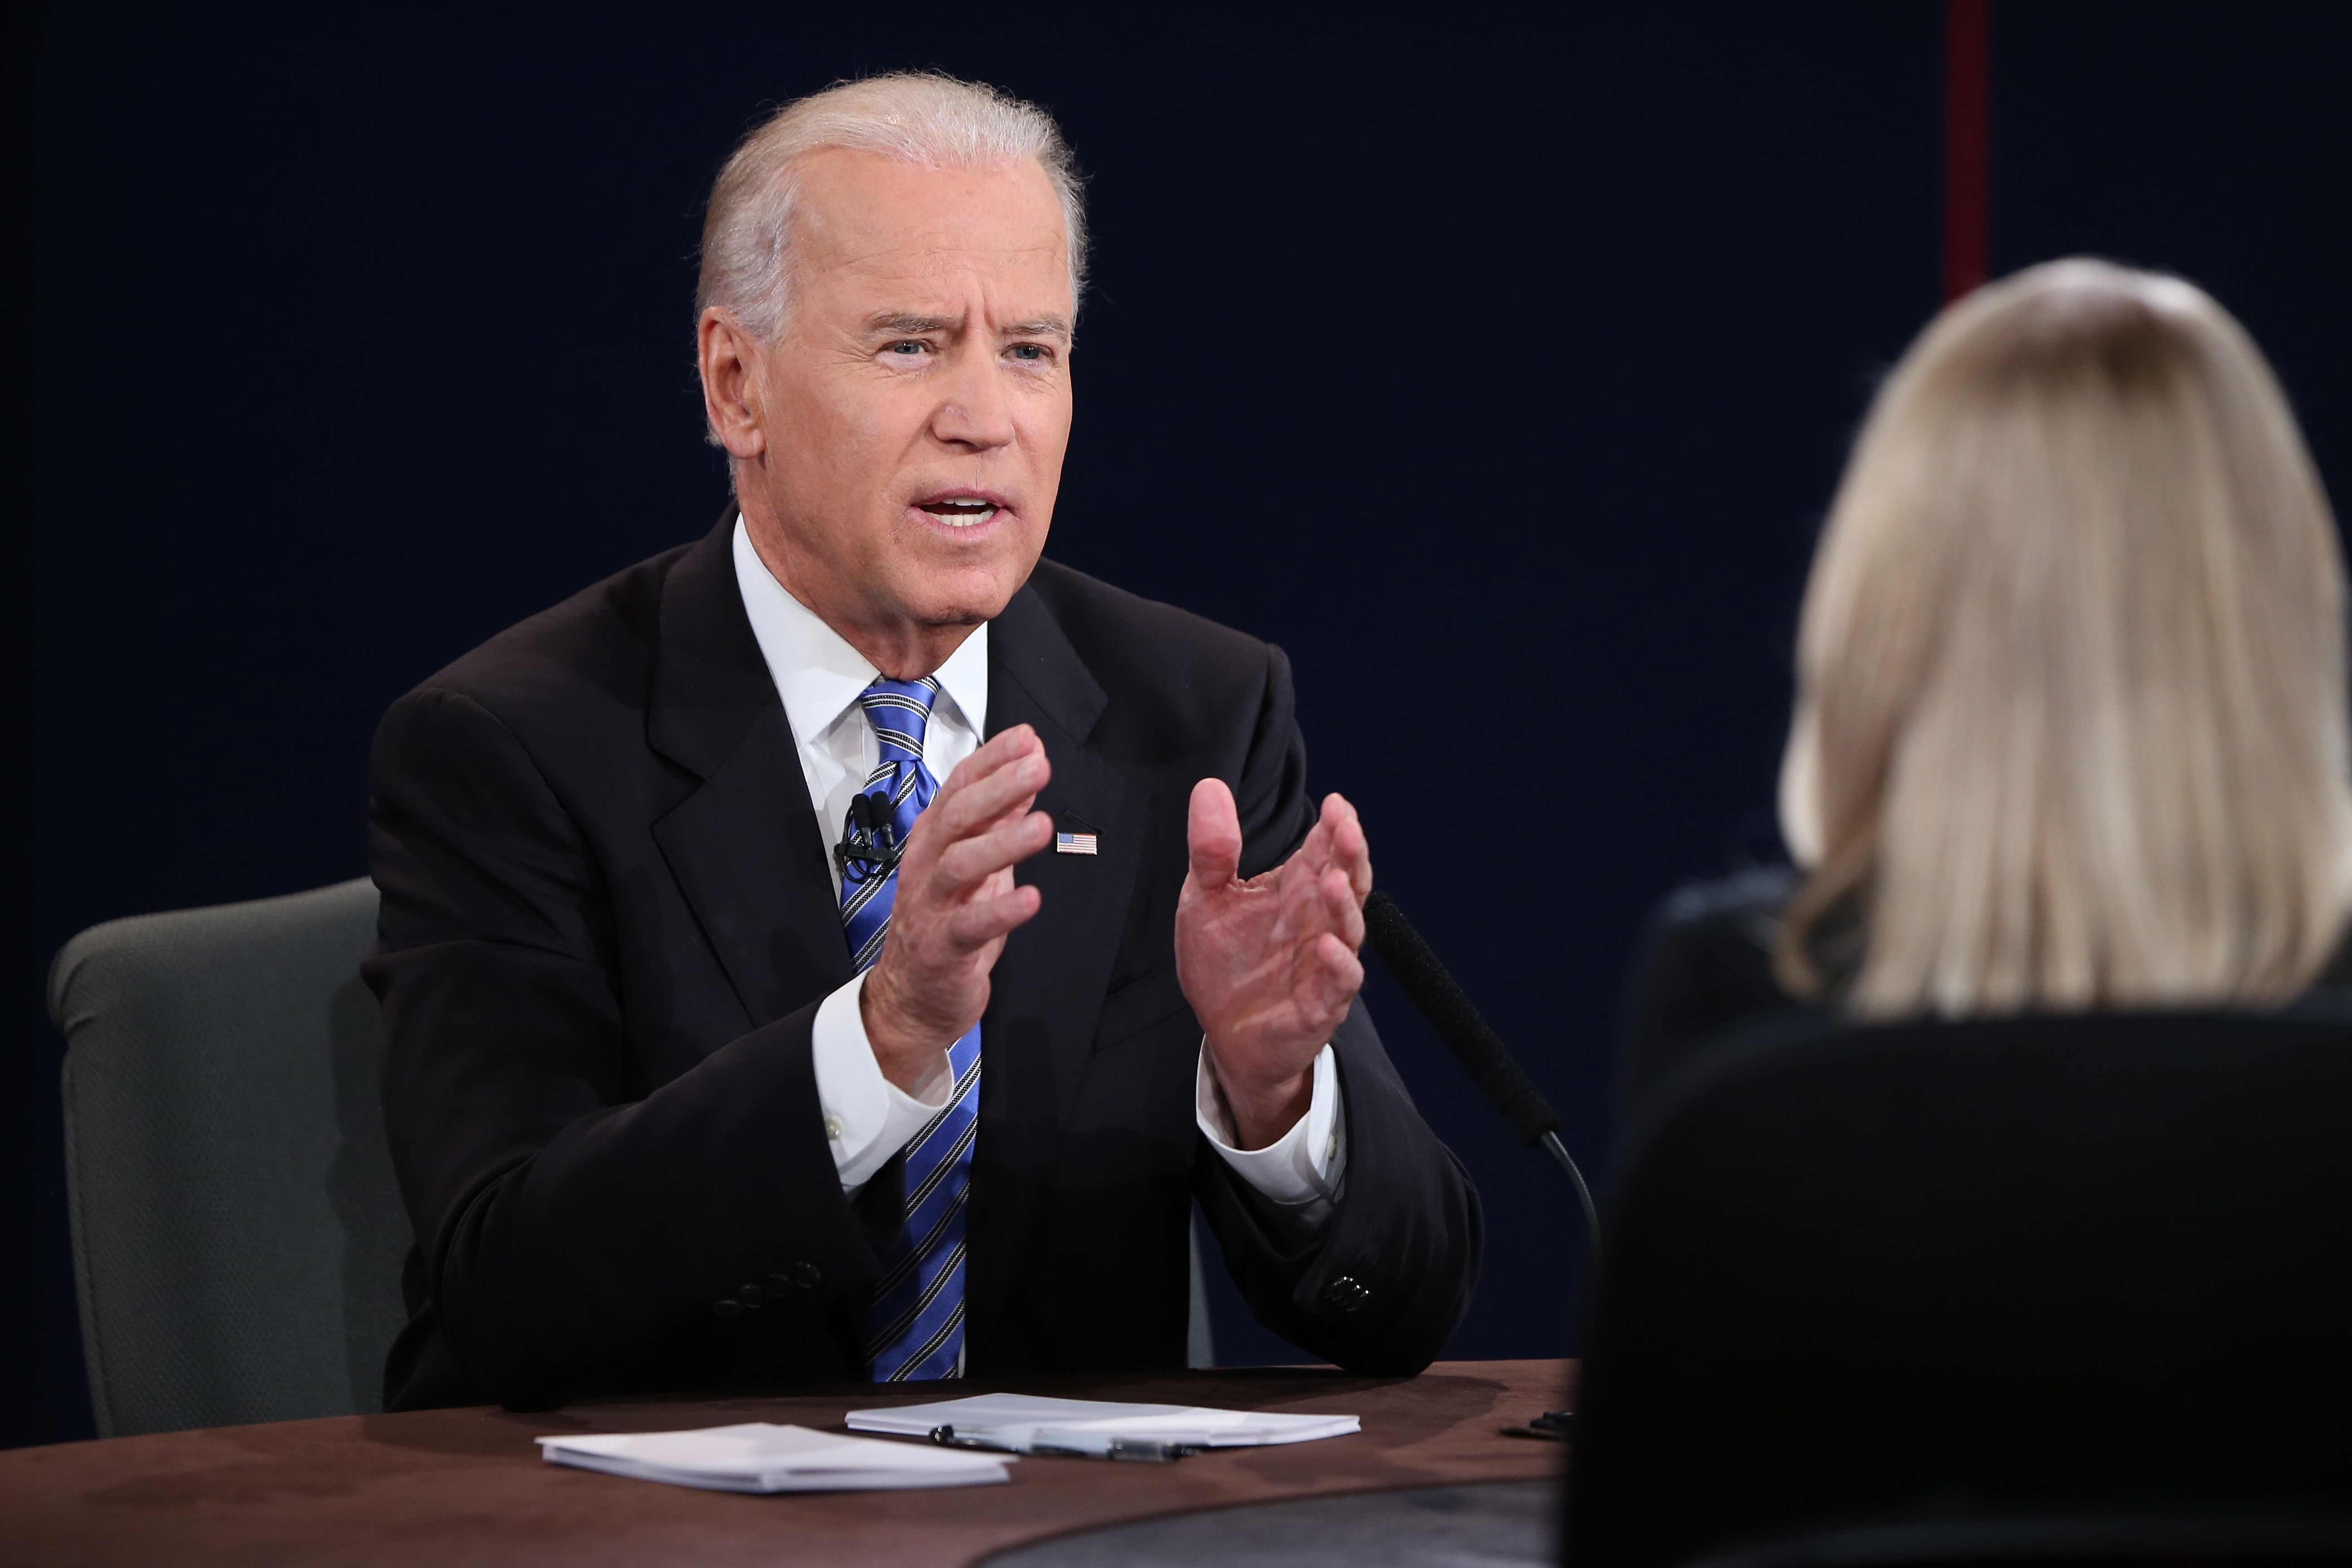 Senate Republicans: No Hearing for Obama's Nominee, Merrick Garland (Video)